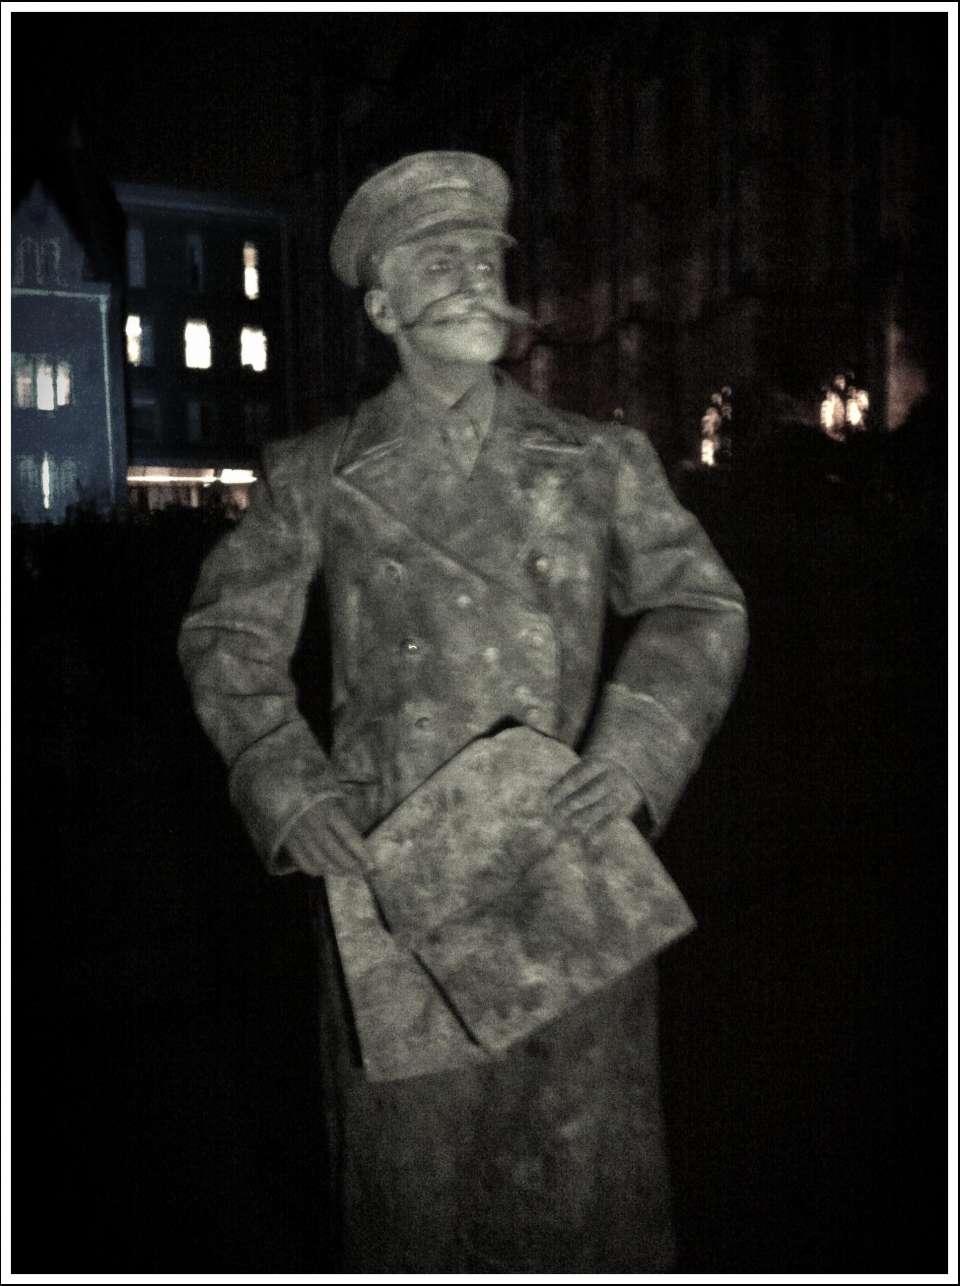 General Haig